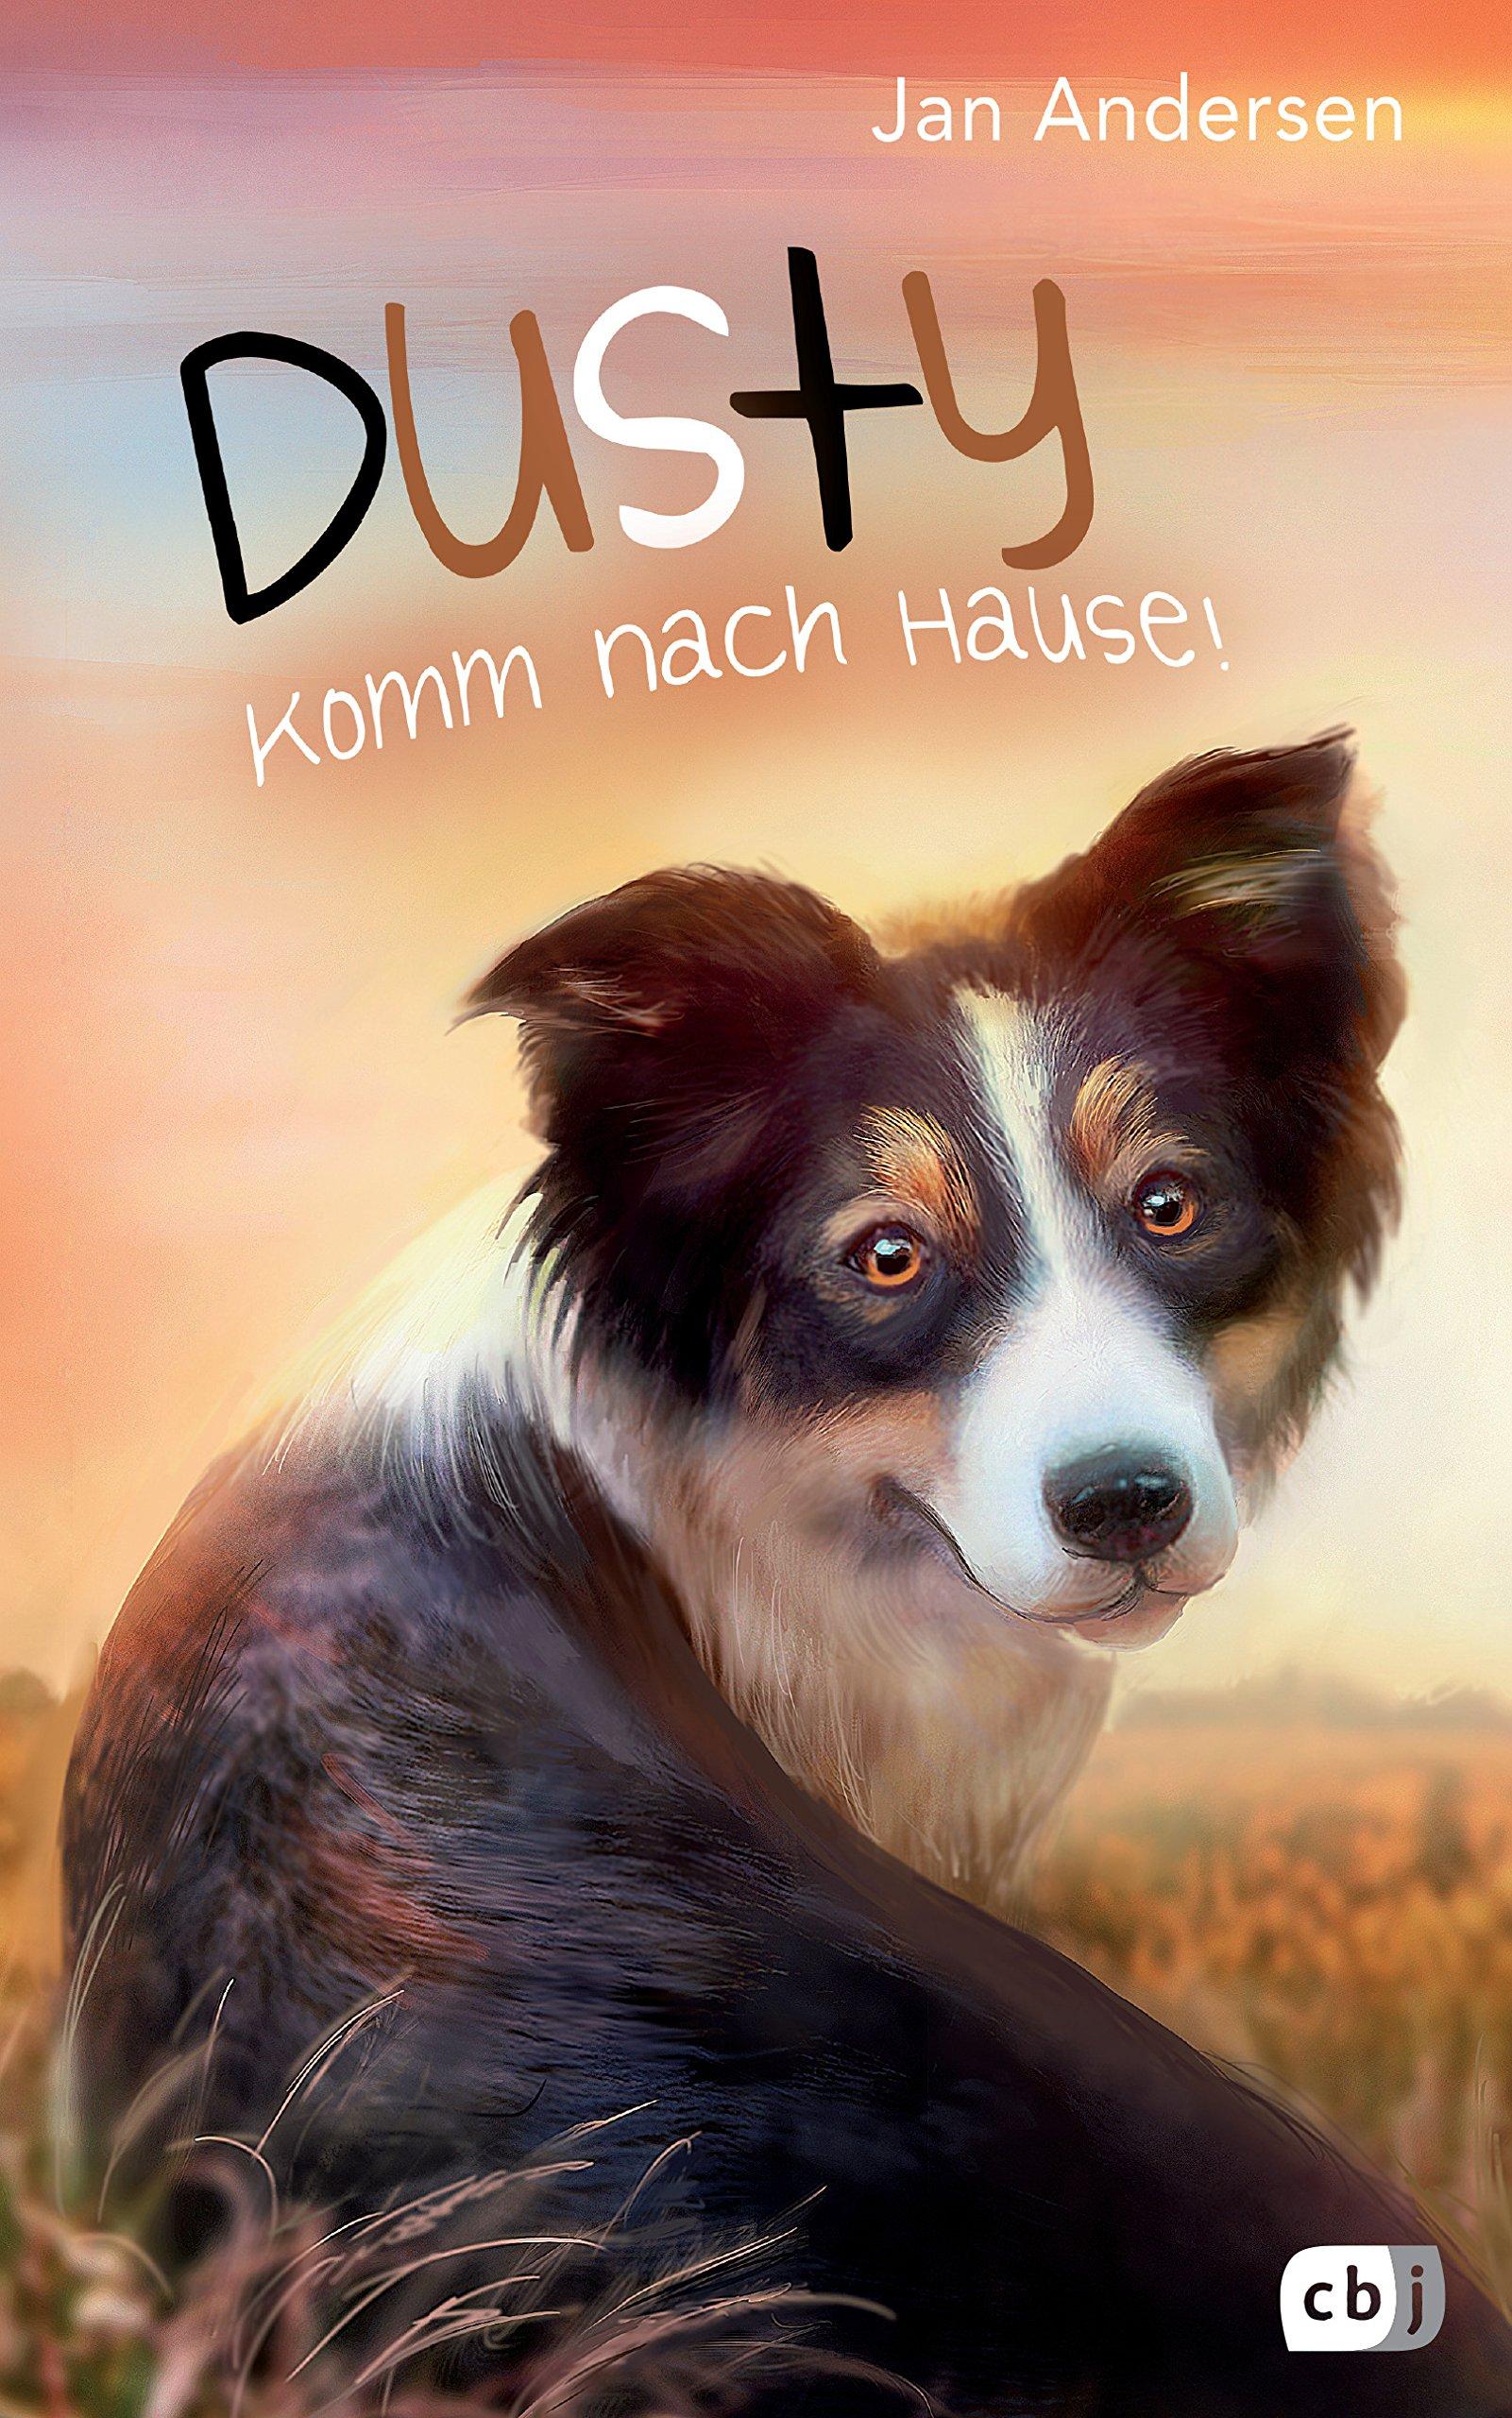 Dusty - Komm nach Hause! (Die Dusty-Reihe, Band 3)